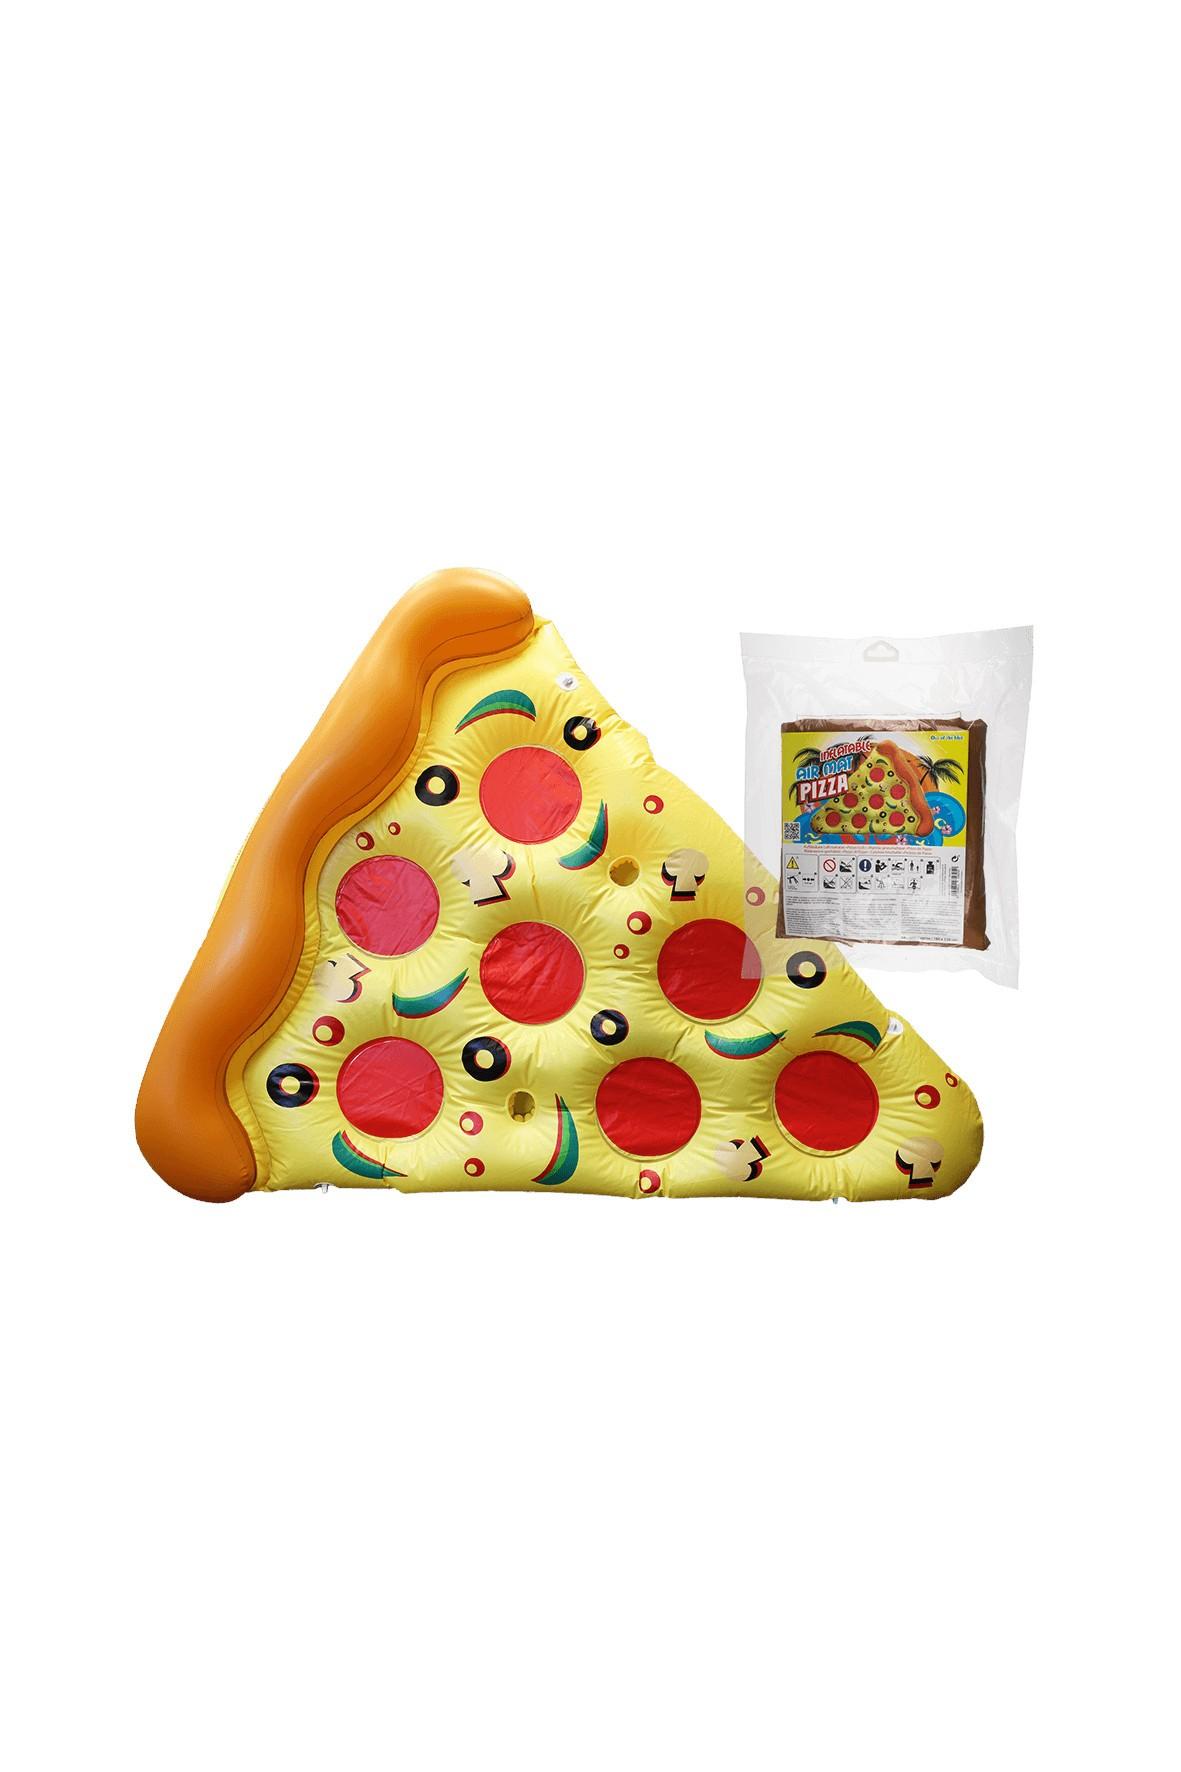 Nadmuchiwany Materac Pizza - 35x31x13 cm